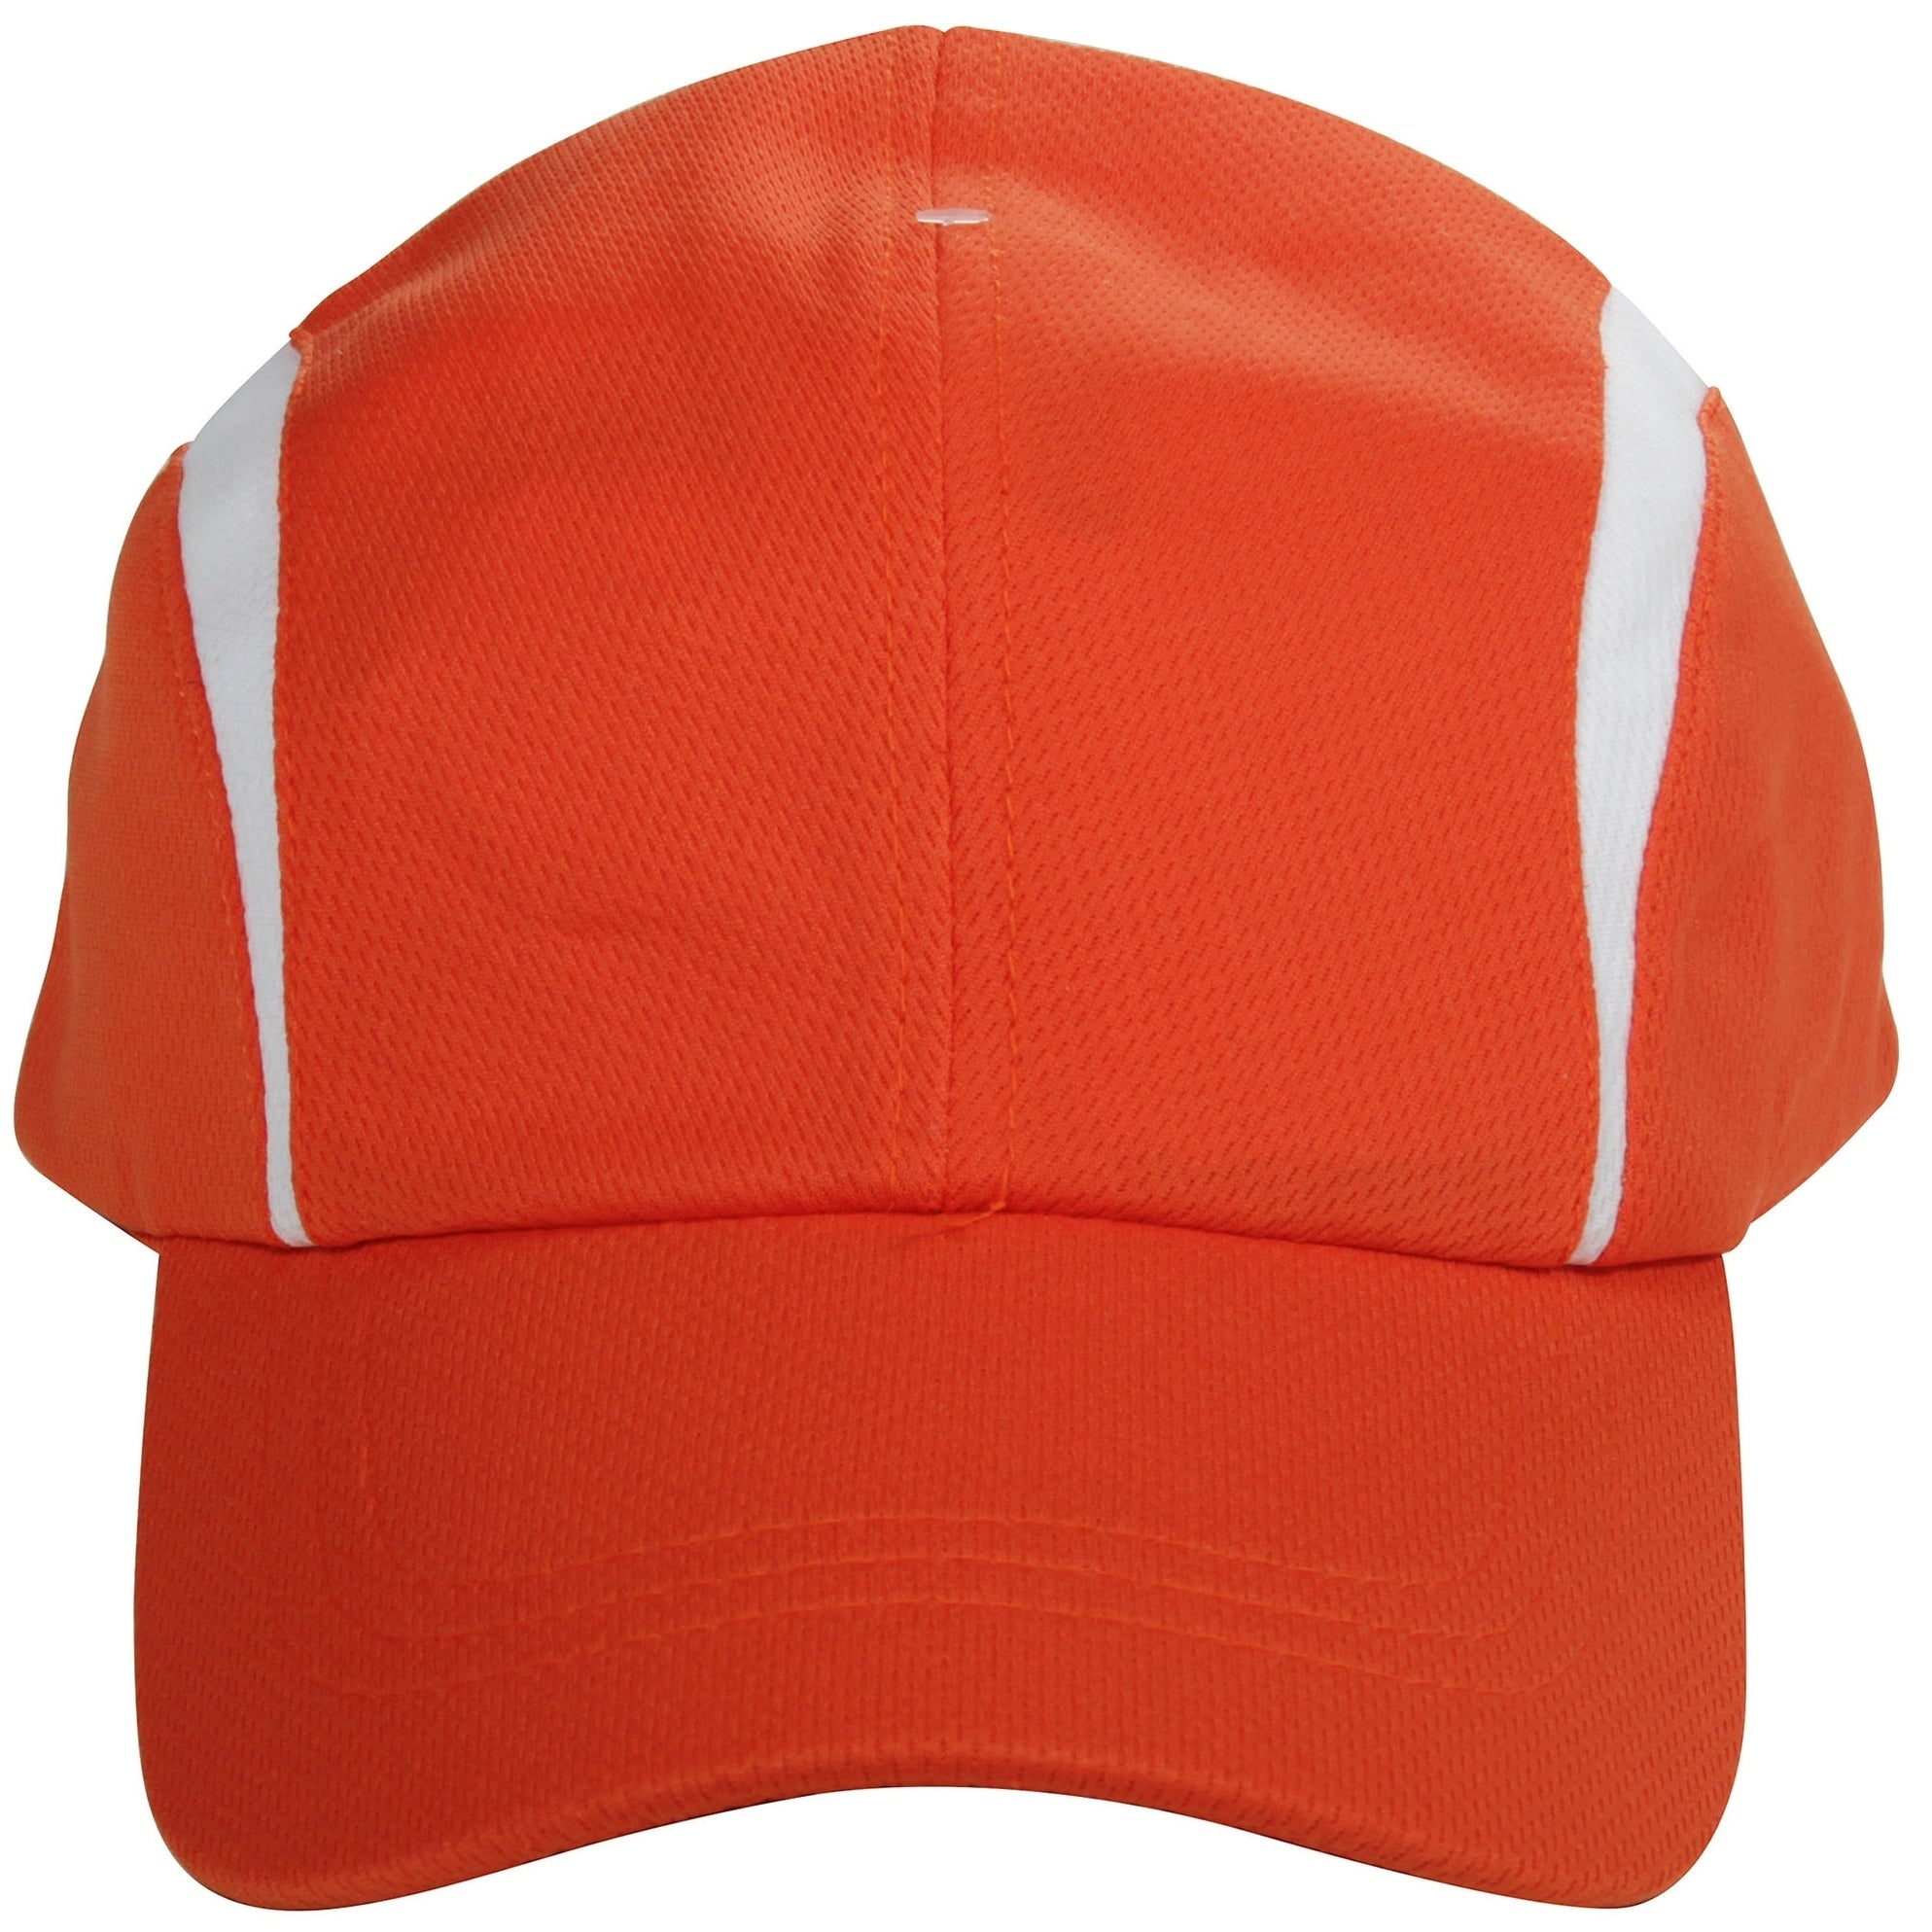 6ebf0cfea5b Shop Unisex Breathable Moisture Wicking Adjustable Sports Baseball ...